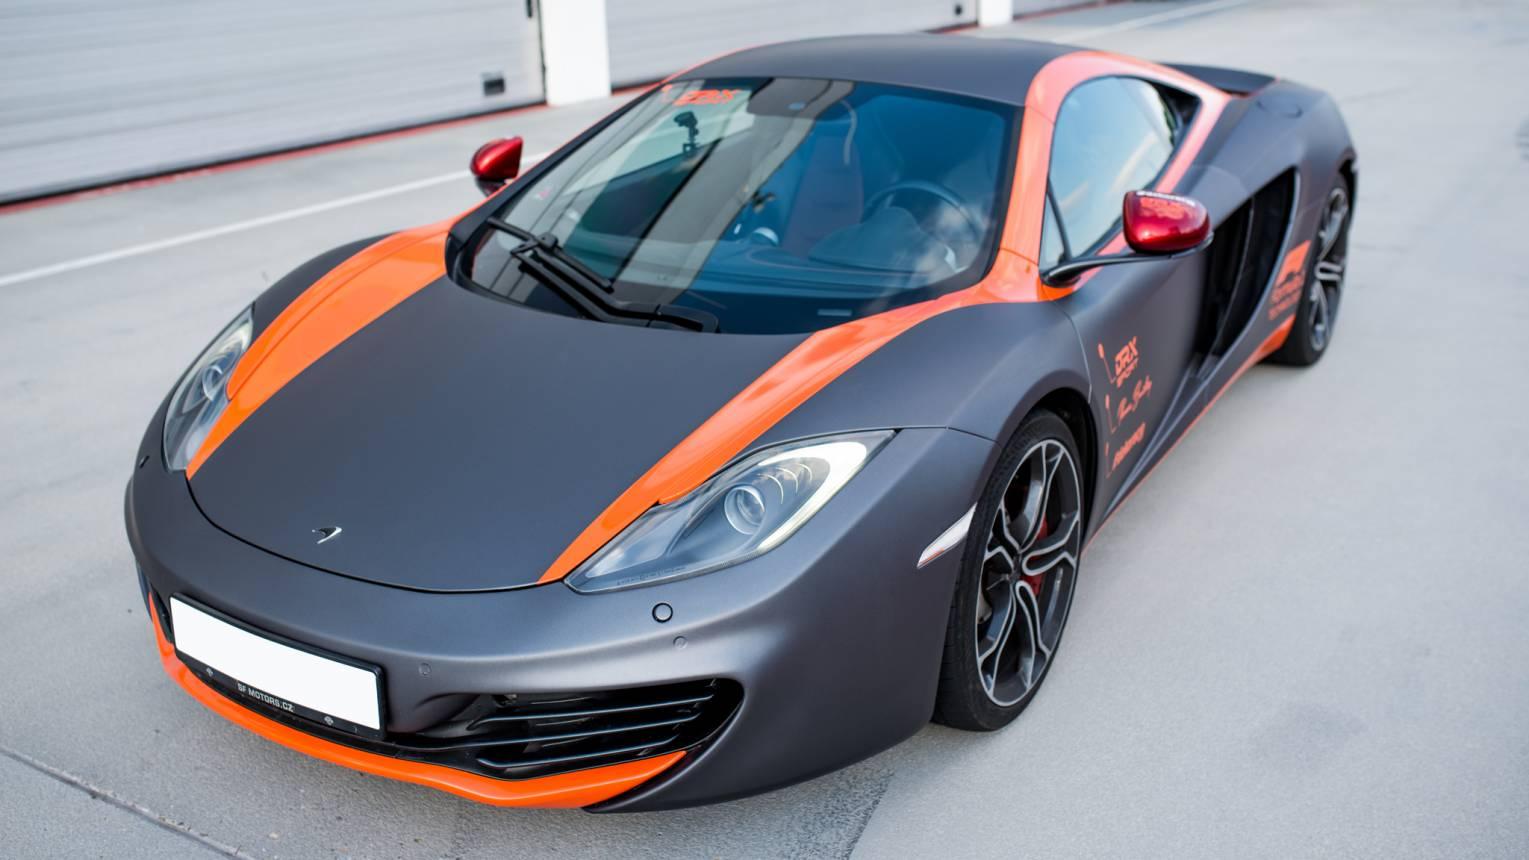 McLaren MP4-12C F1 vezetés a Hungaroringen